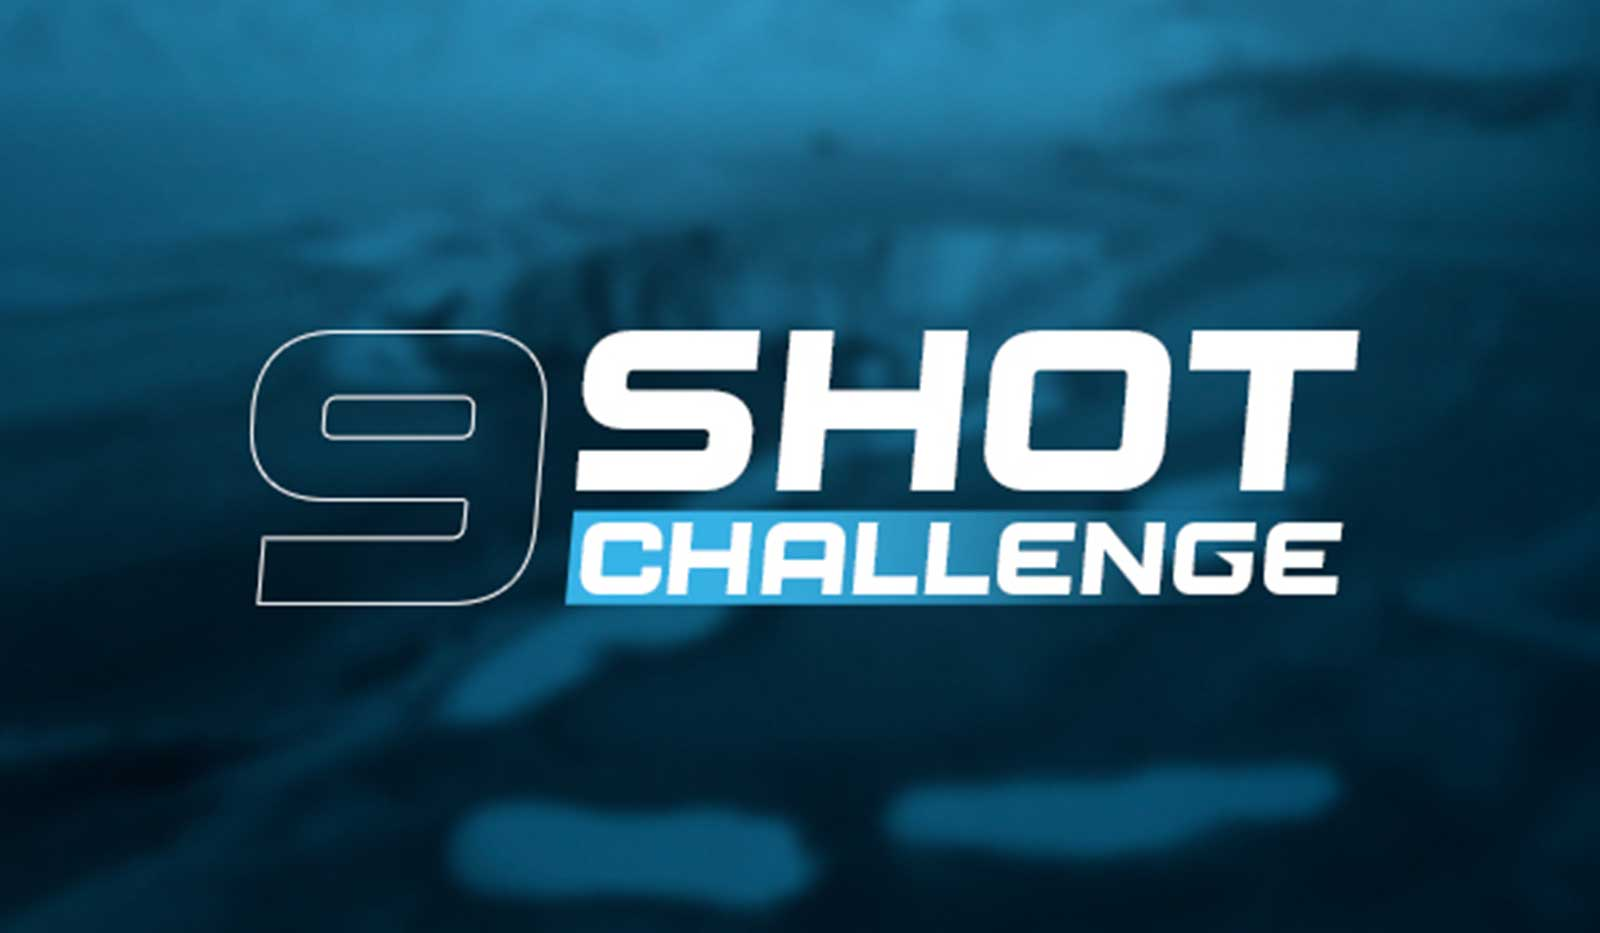 Topgolf 9-Shot-Challenge